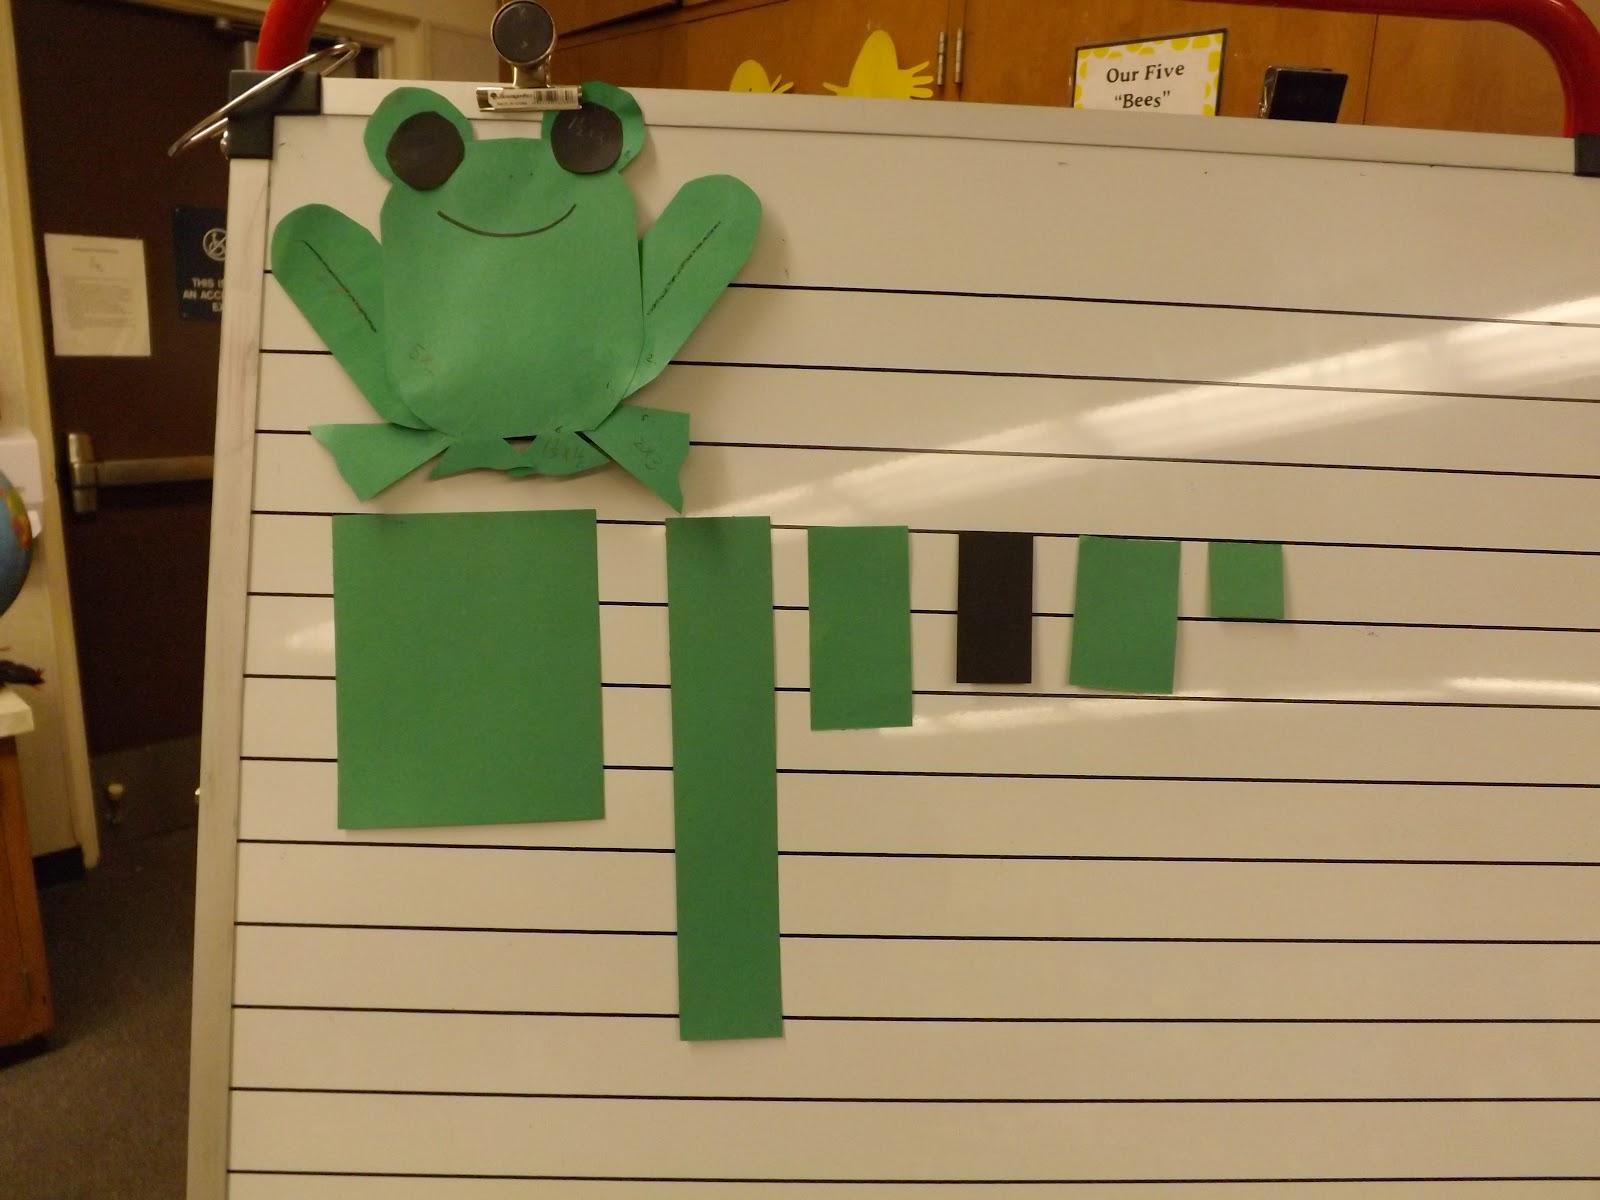 venn diagram of reptiles and amphibians simple human heart mrs vento 39s kindergarten